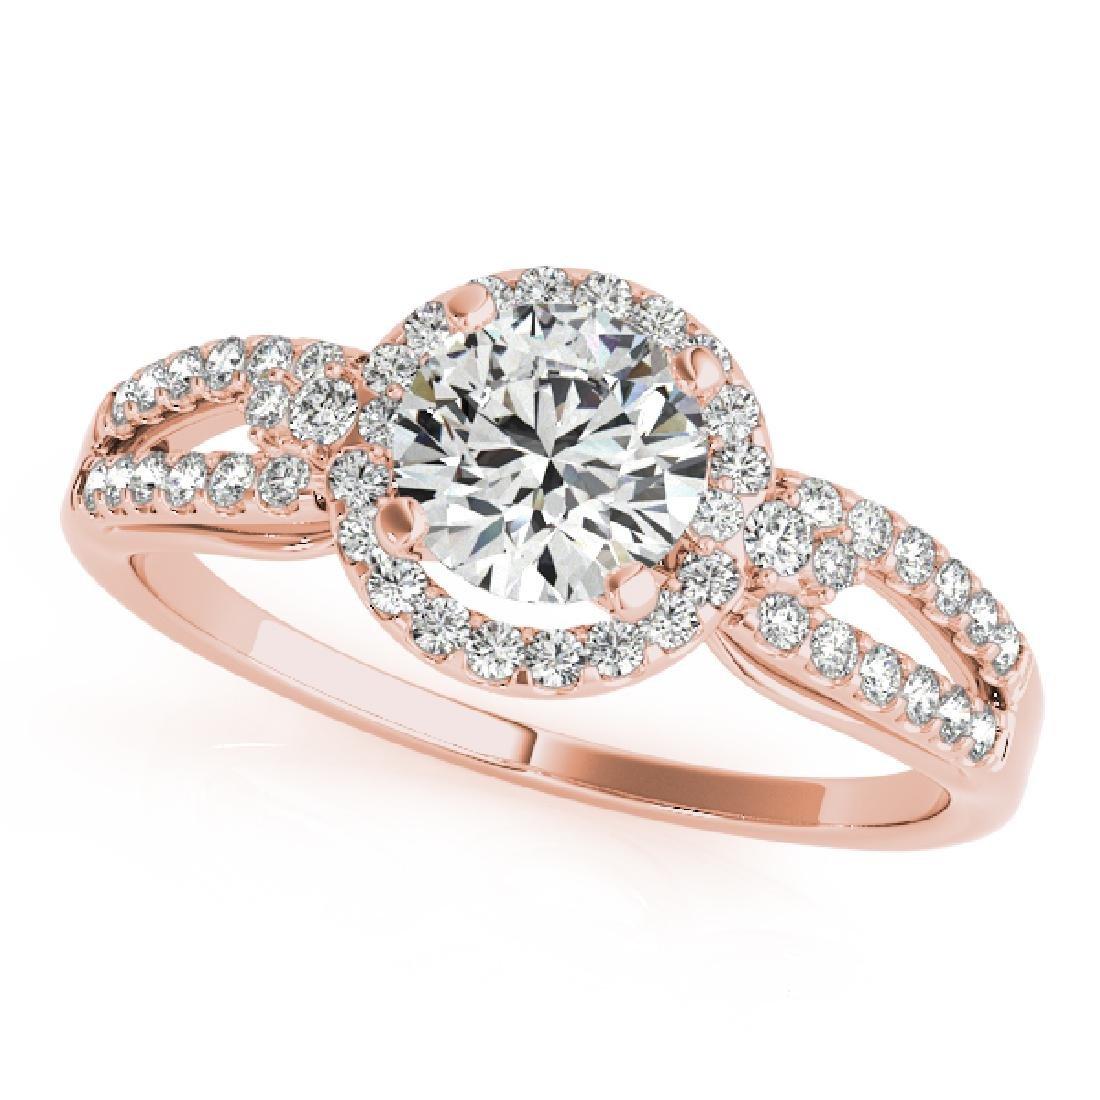 CERTIFIED 18K ROSE GOLD 1.00 CT G-H/VS-SI1 DIAMOND HALO